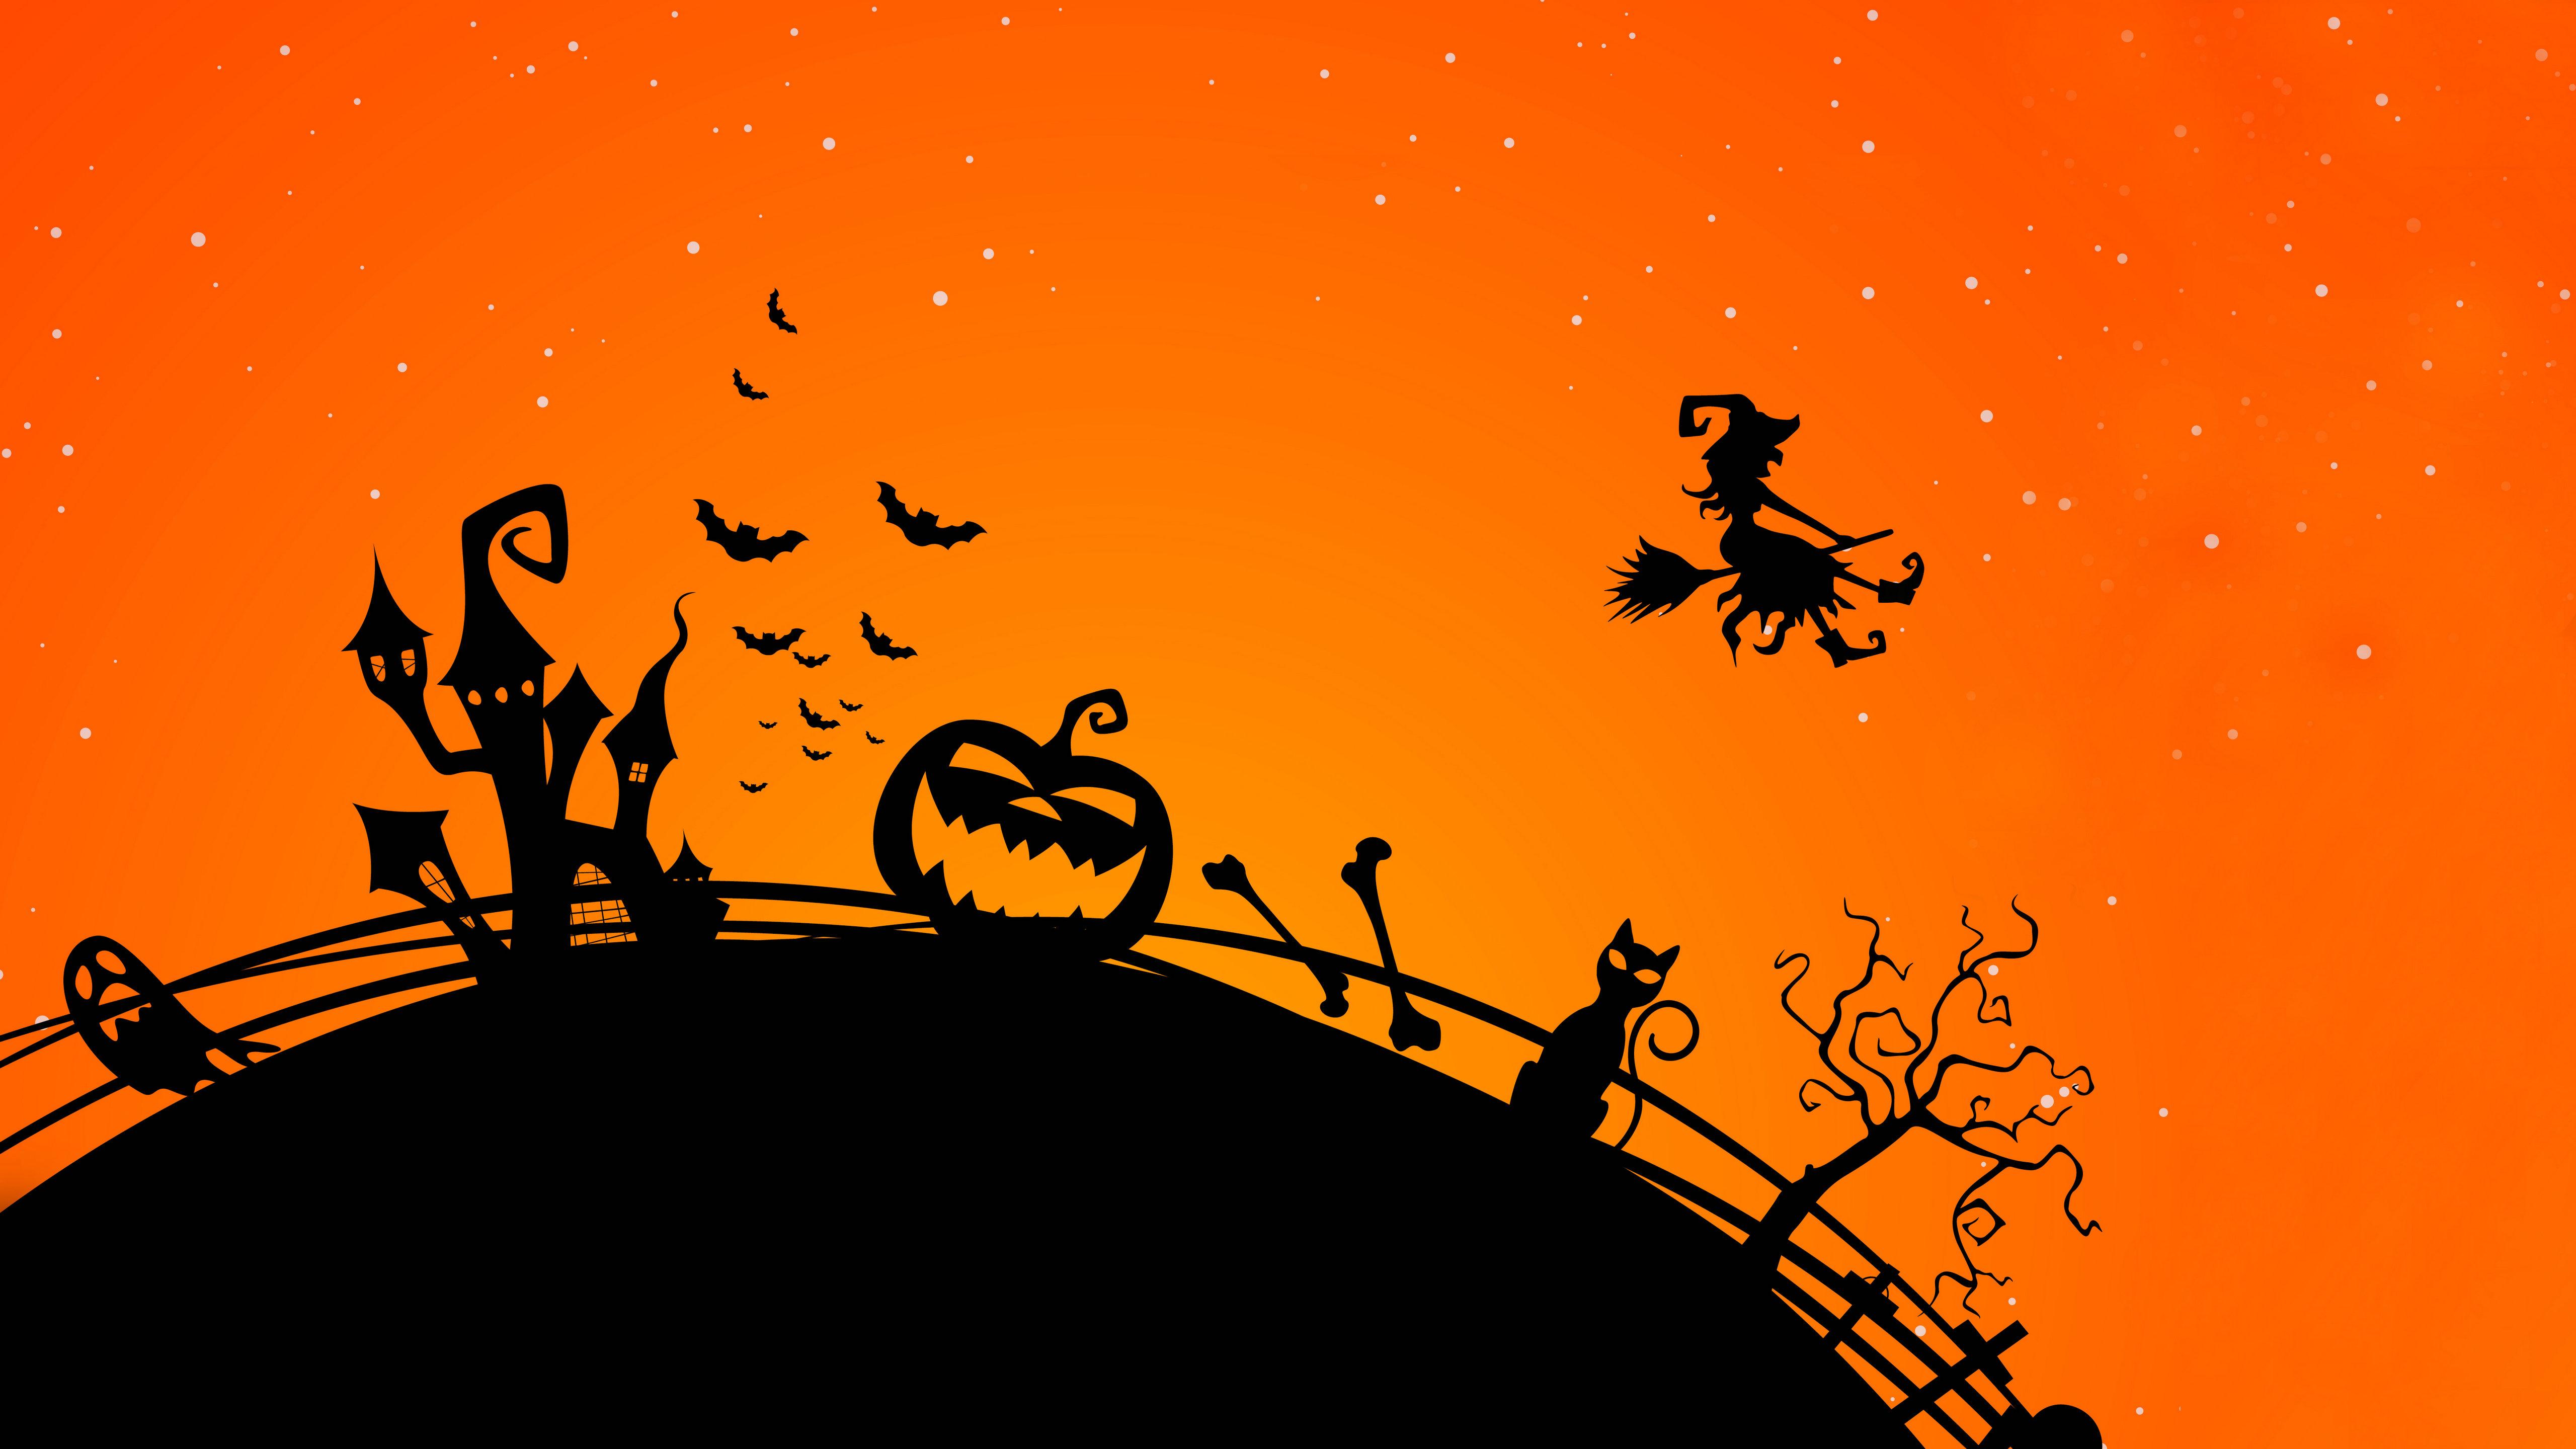 5120x2880 Free Halloween Background